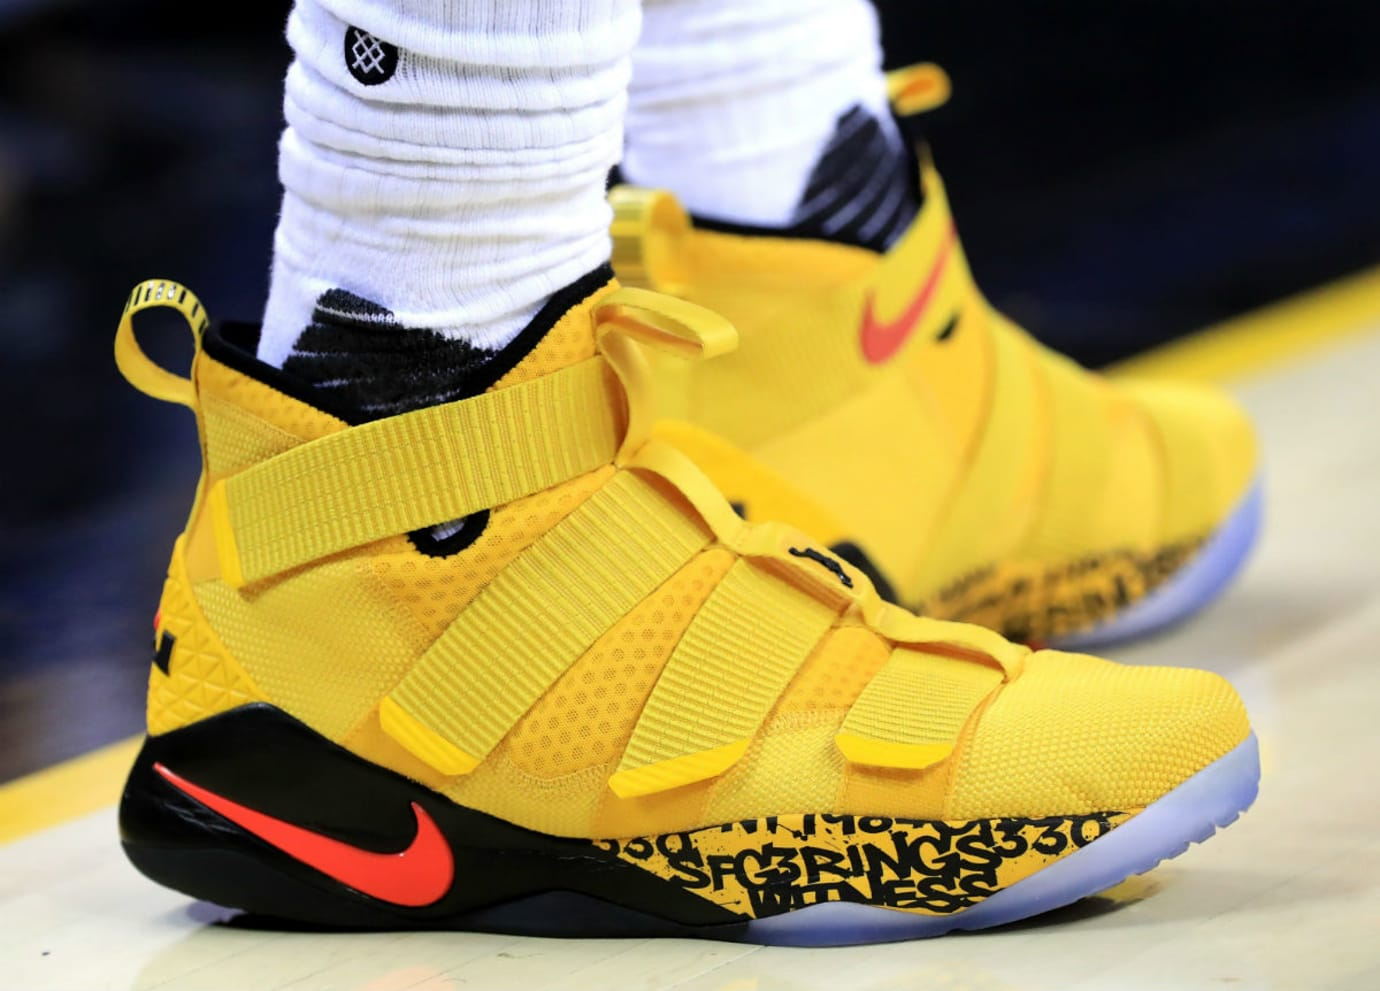 170ff755f0d9 LeBron James Nike LeBron Soldier 11 Yellow Game 4 PE